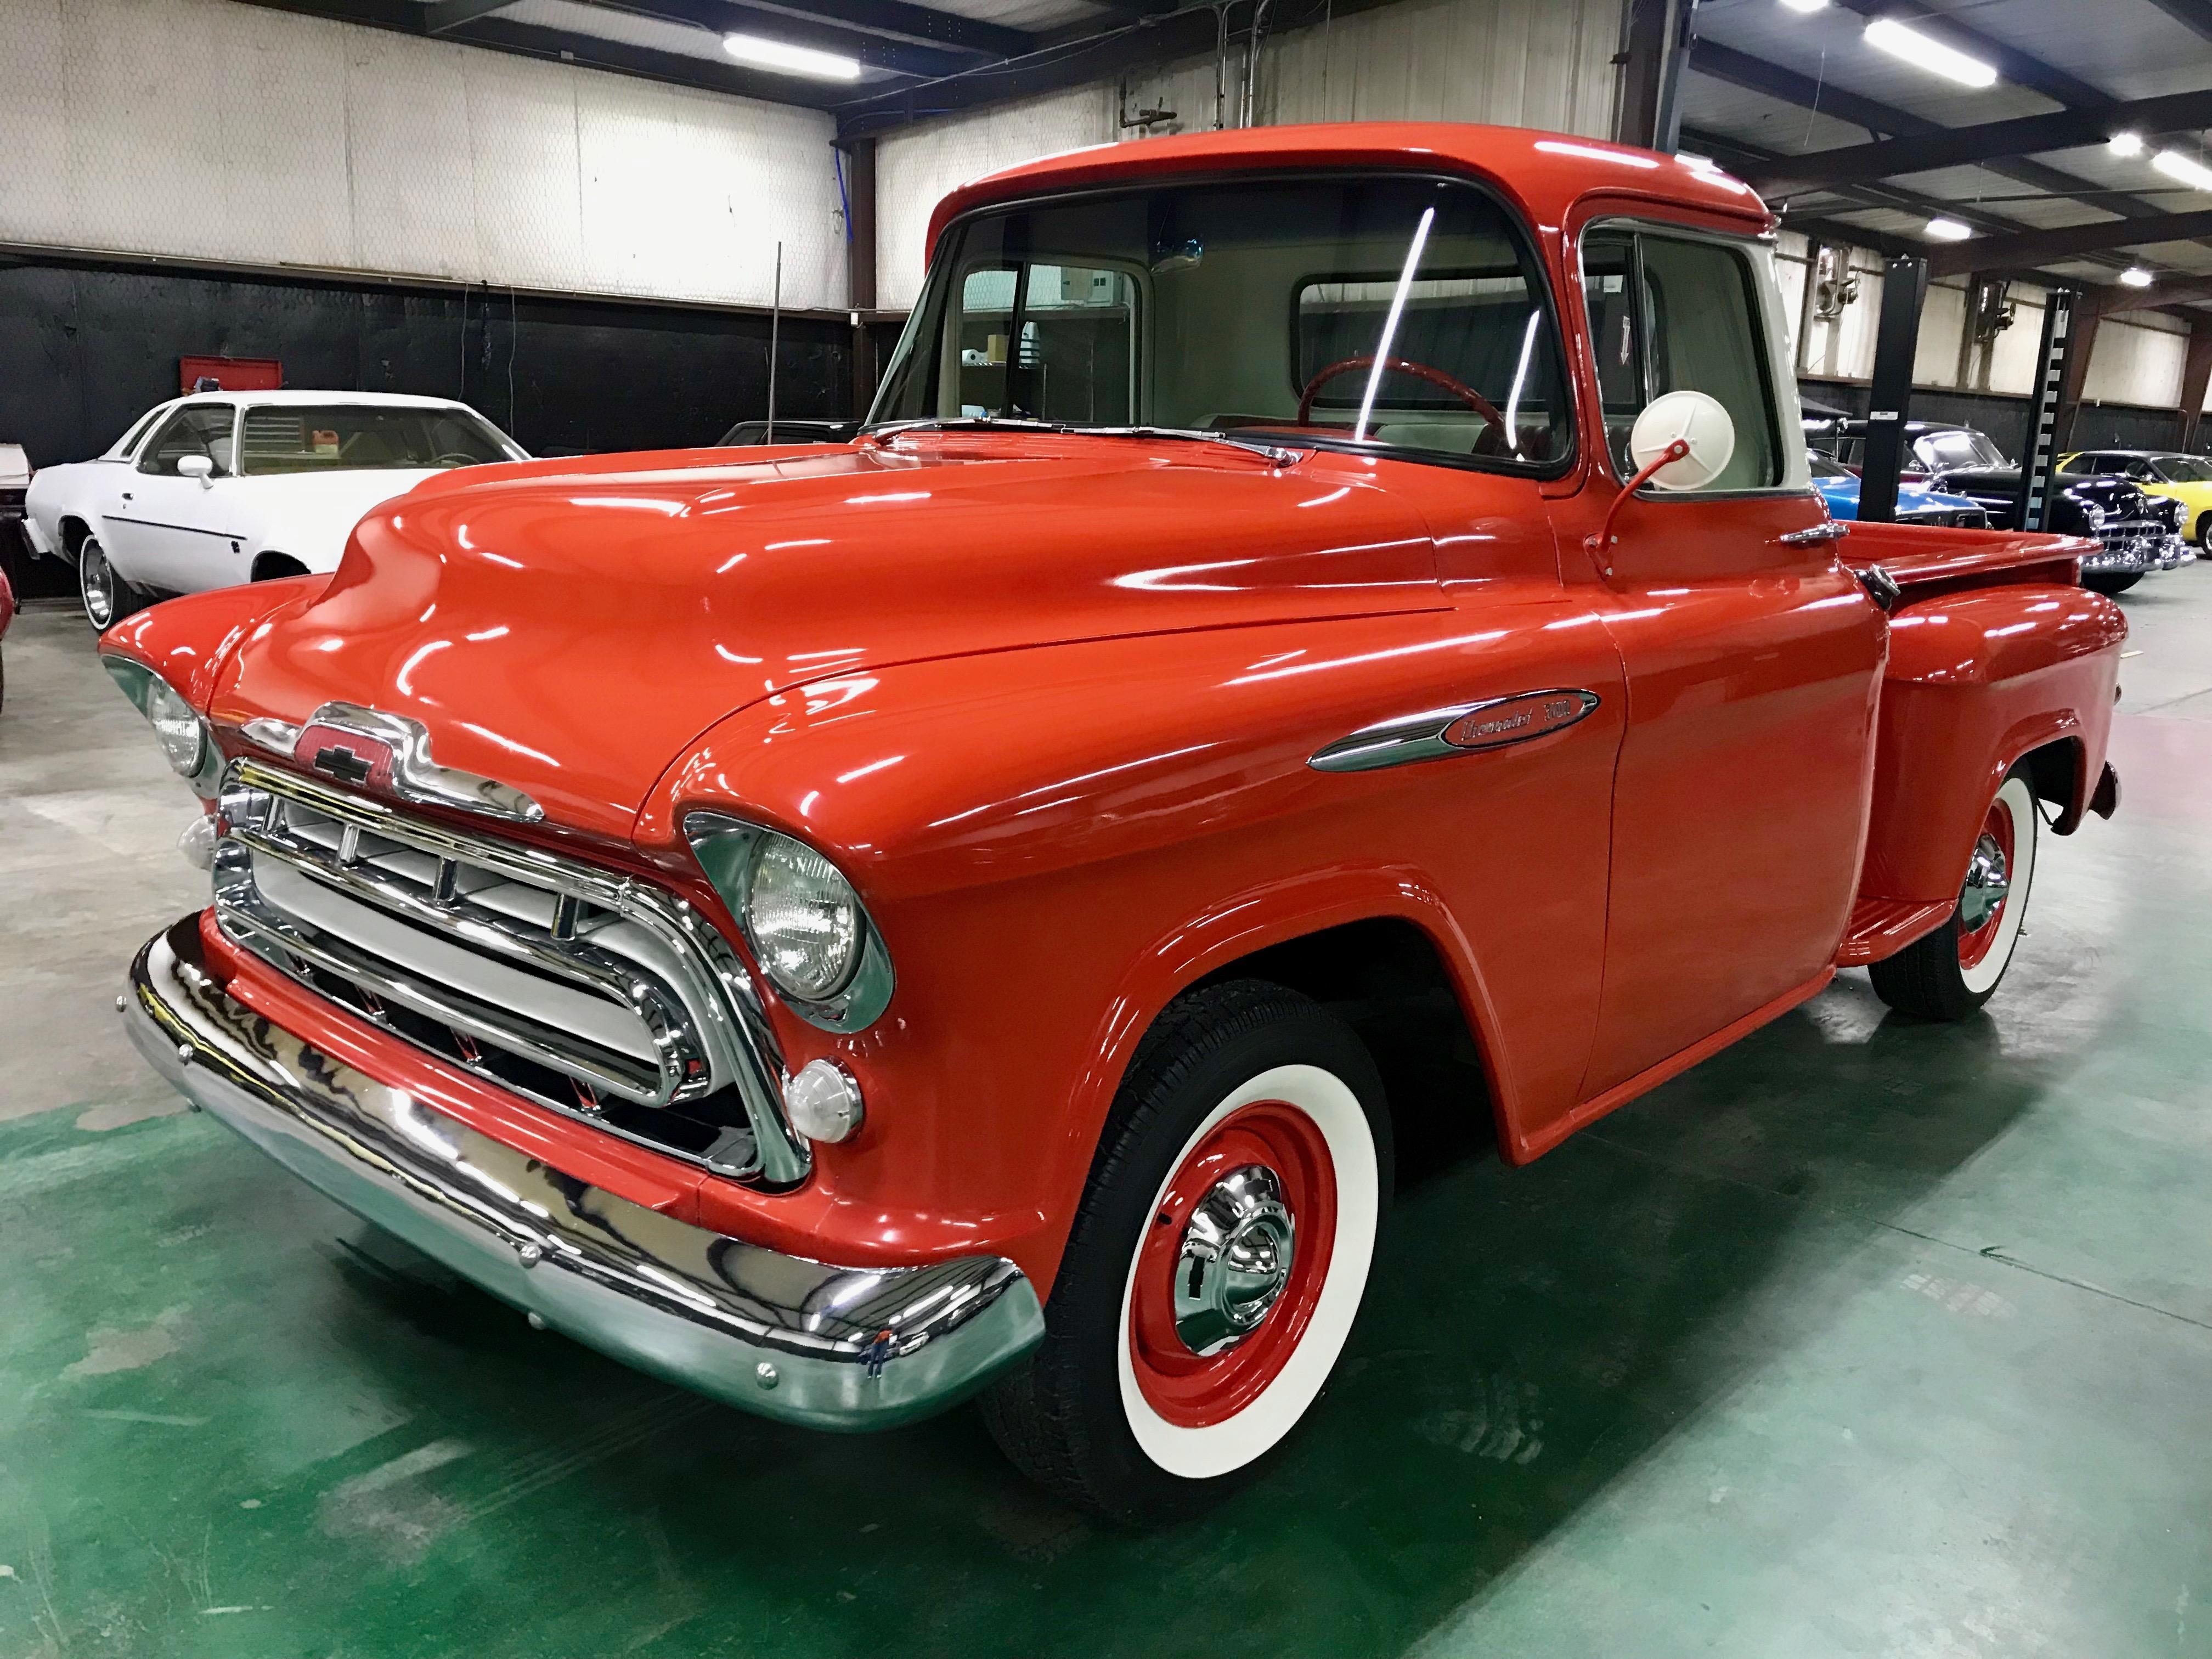 Classic Vehicle Auto-Transport